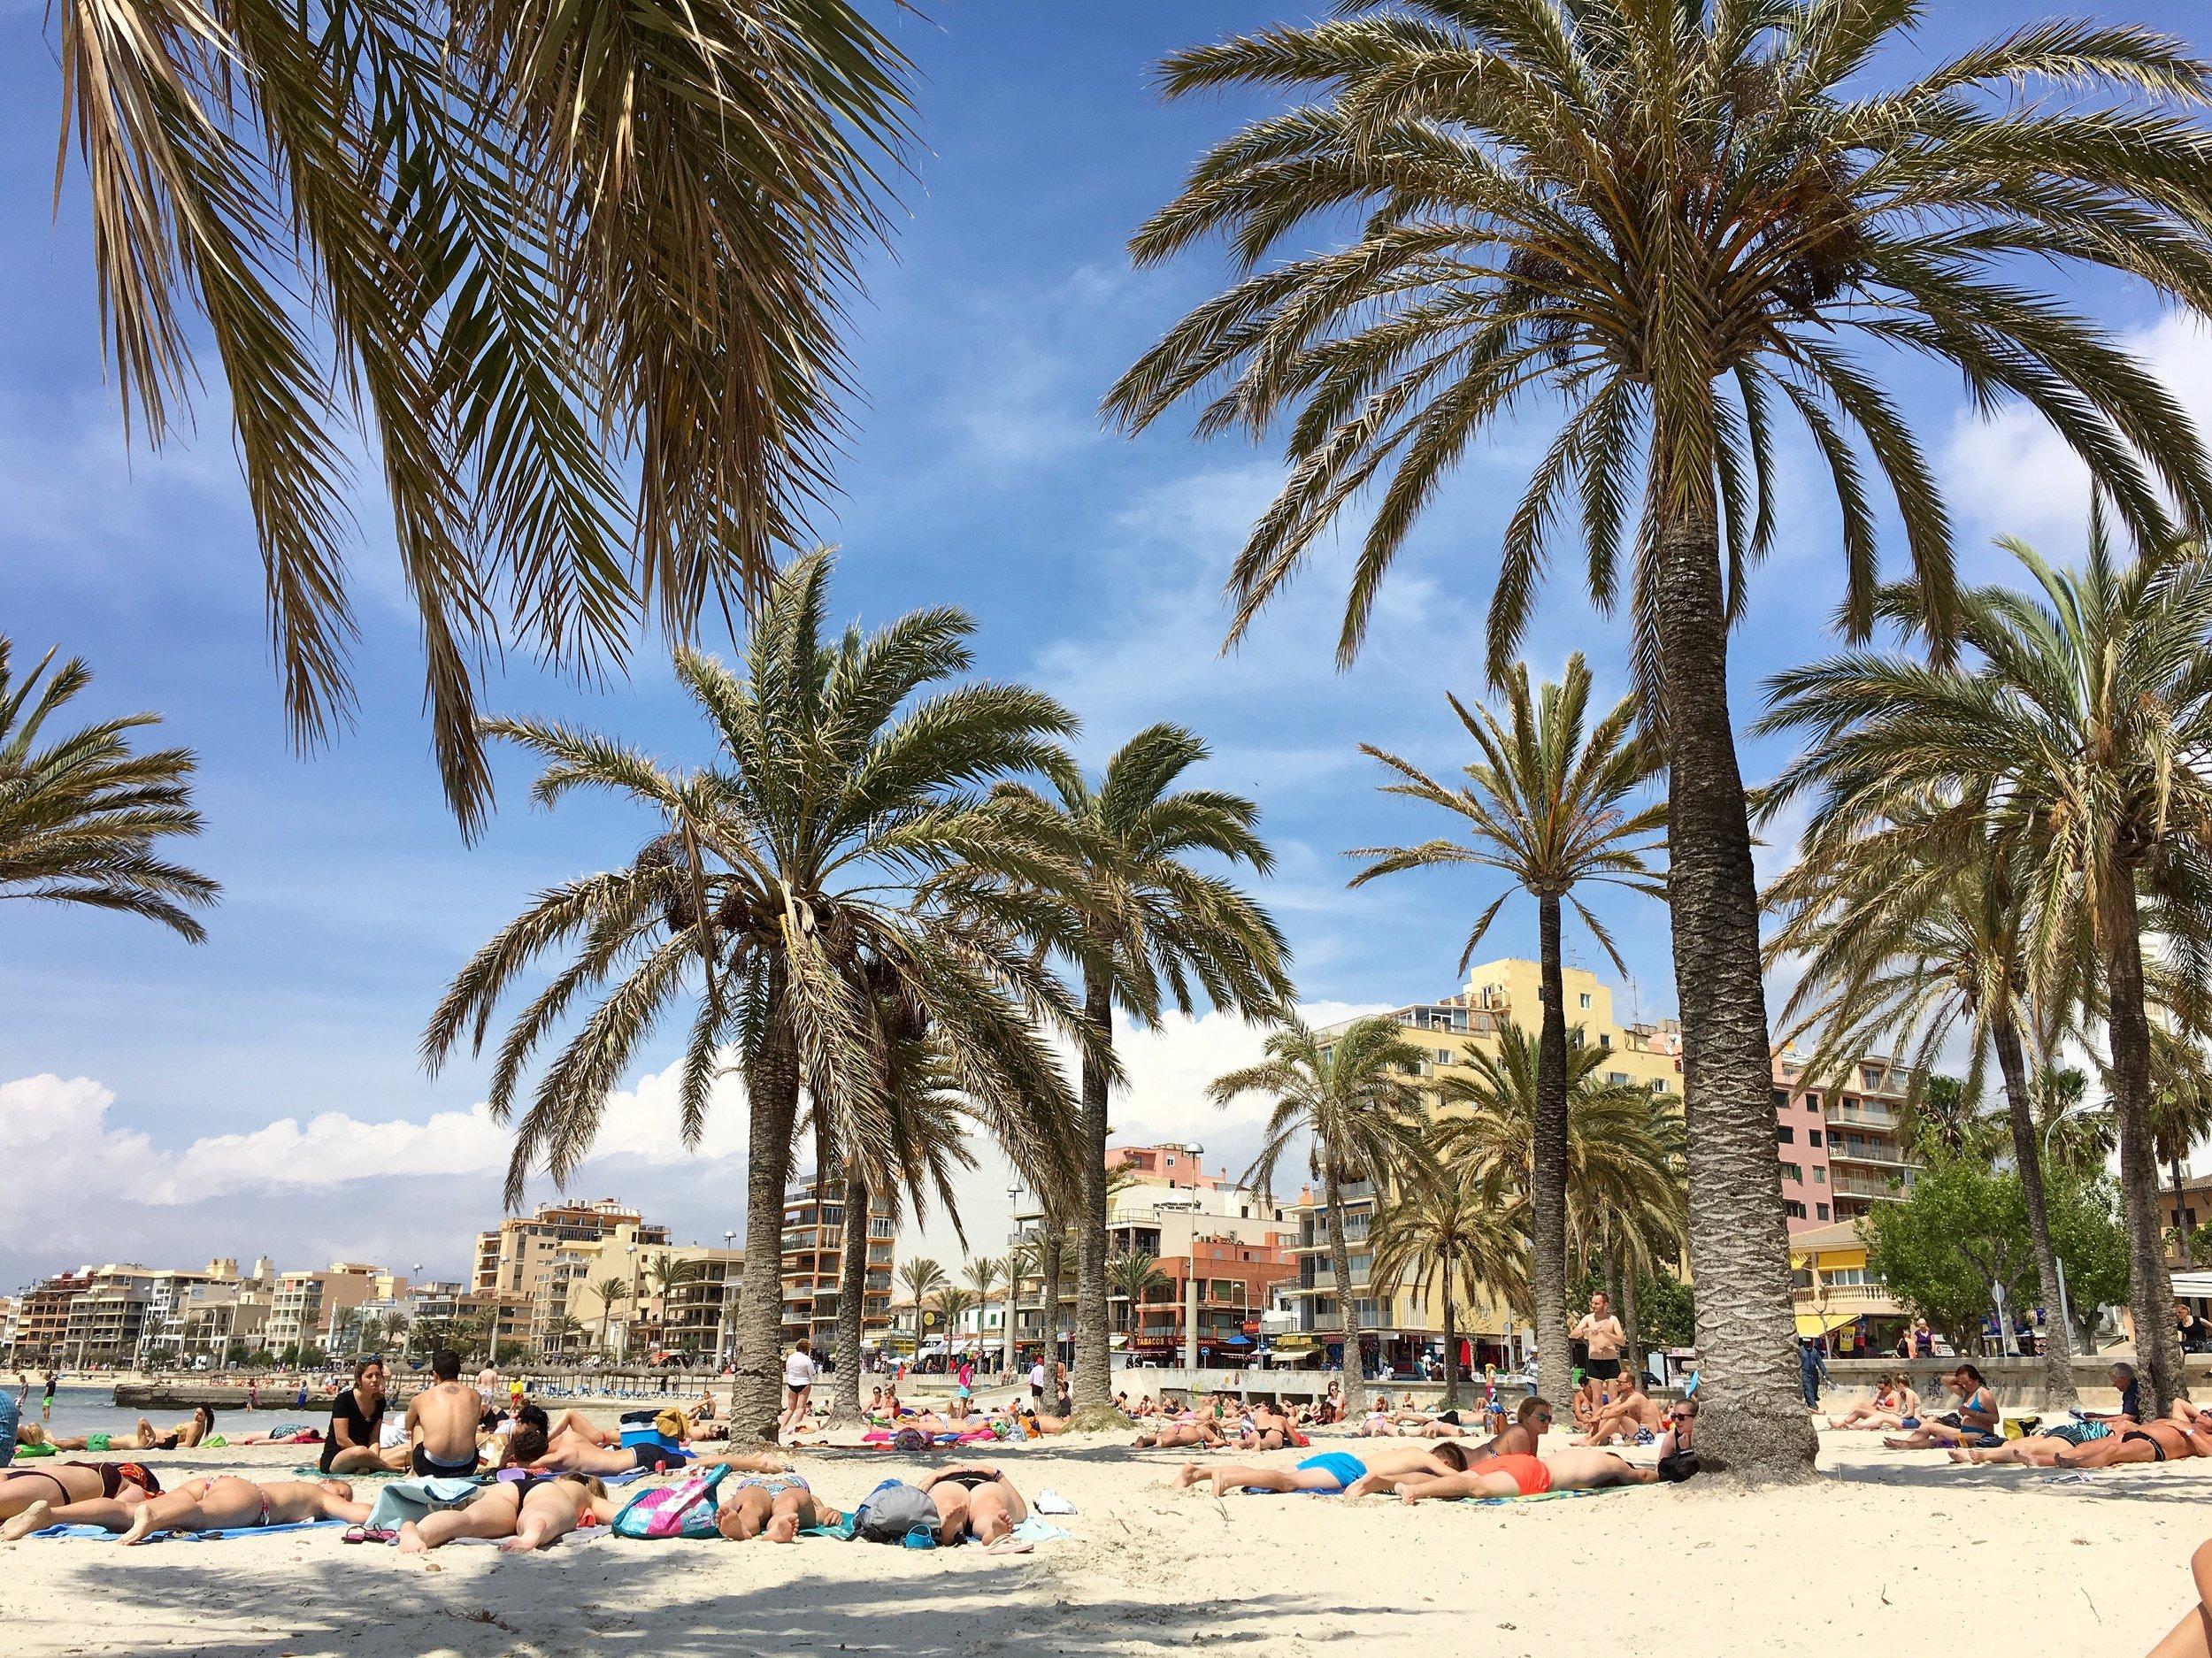 El Arenal playa- Mallorca, Spain